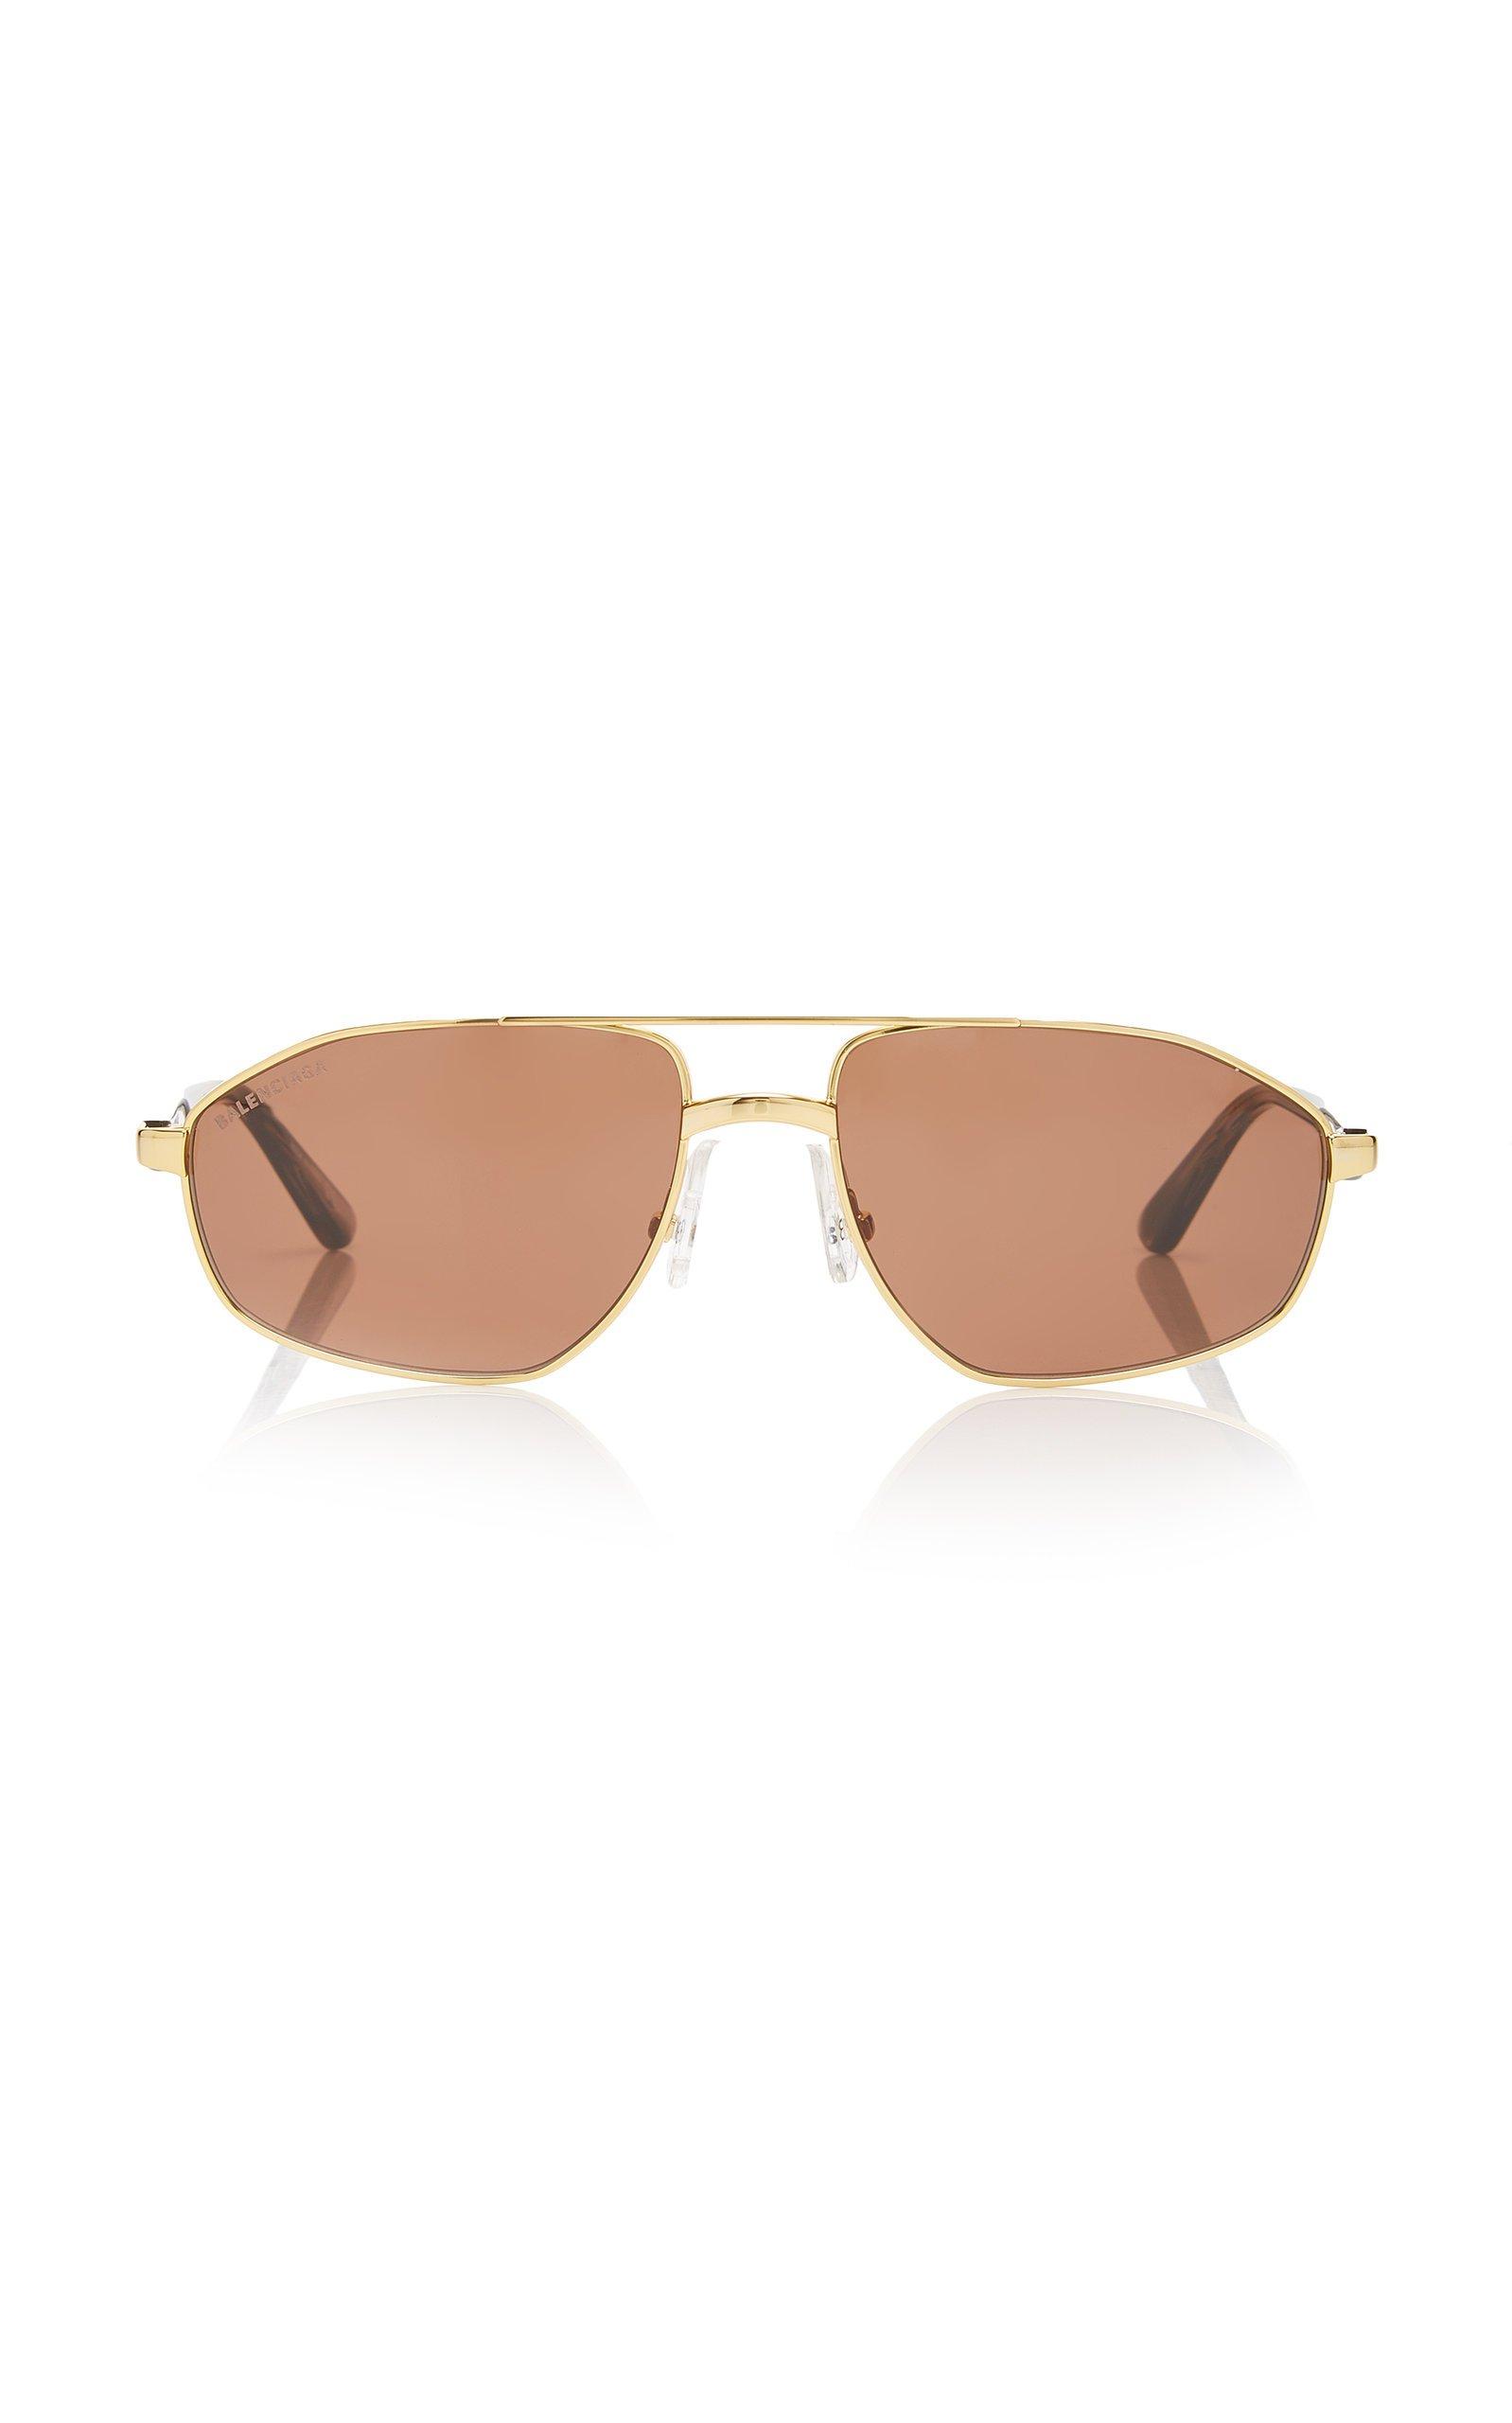 Balenciaga Gold-Tone Metal Aviator-Style Sunglasses